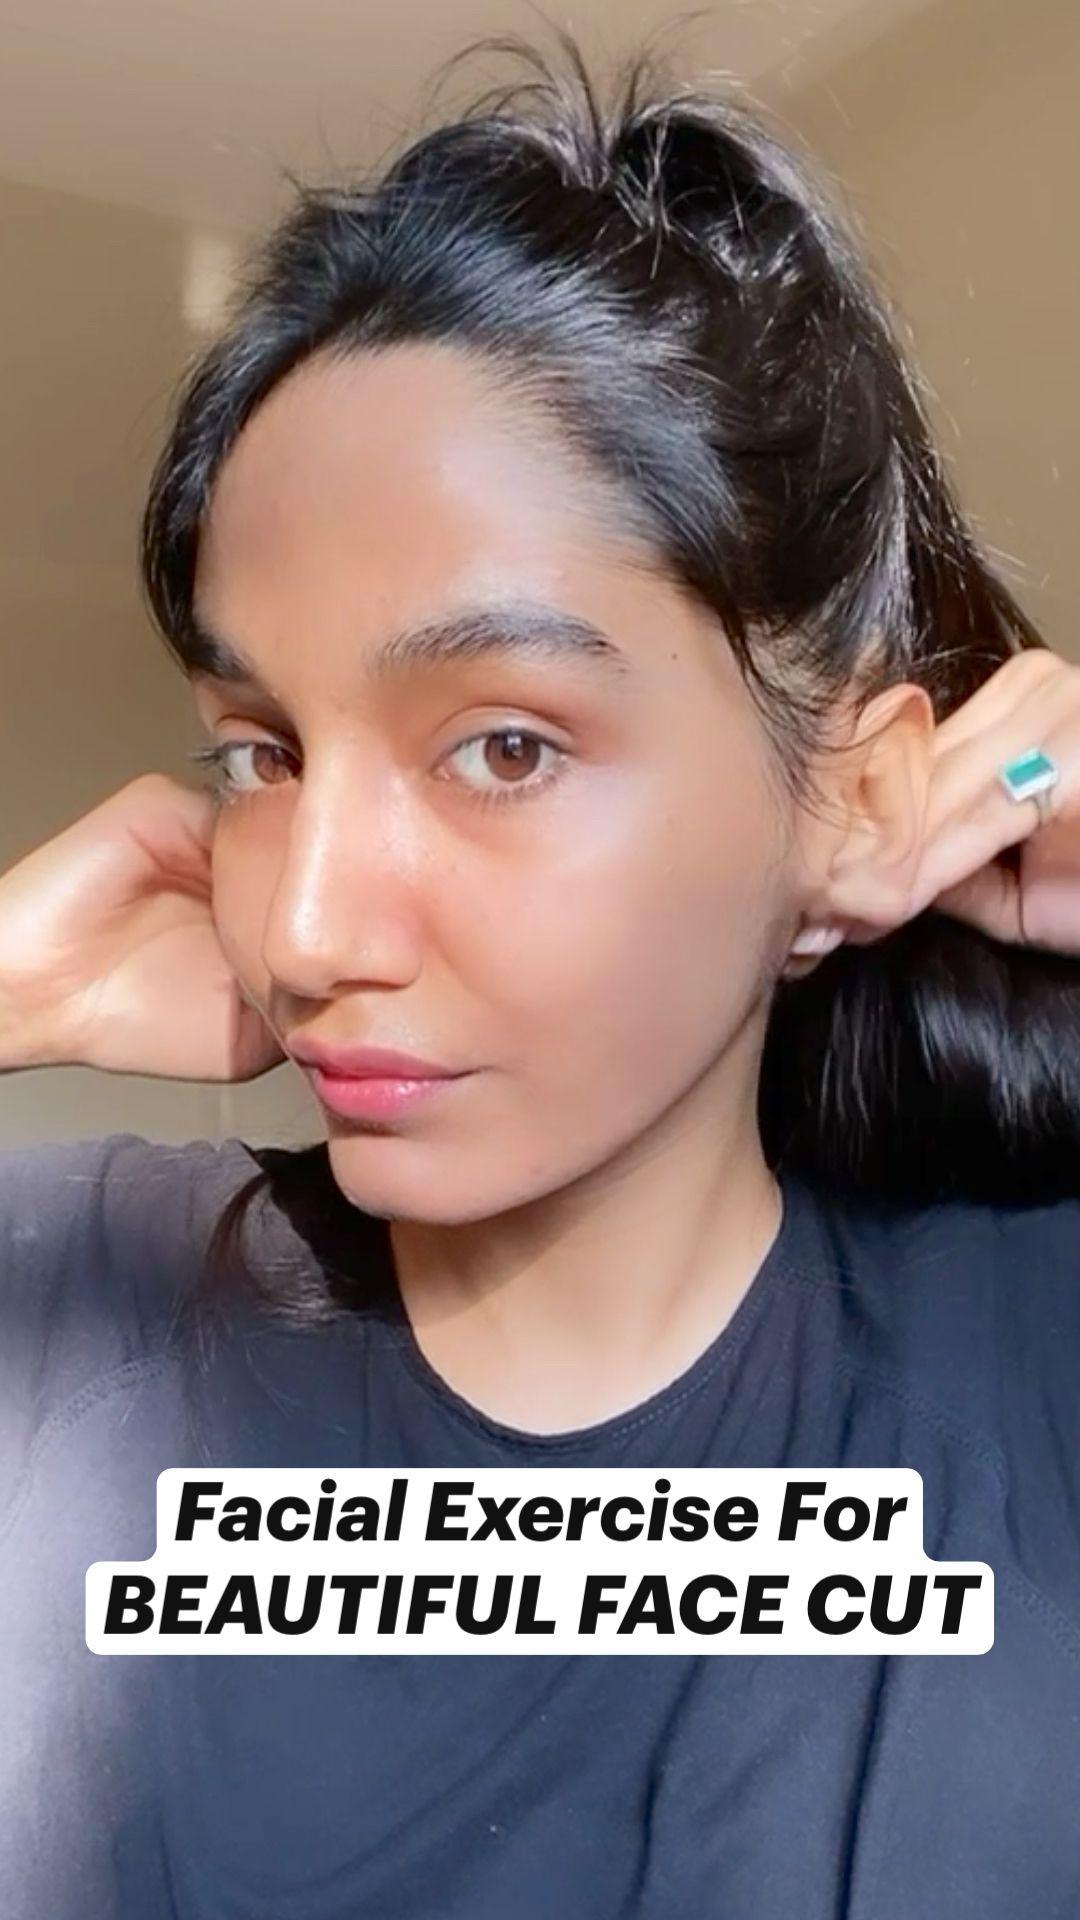 Facial Exercise For  BEAUTIFUL FACE CUT